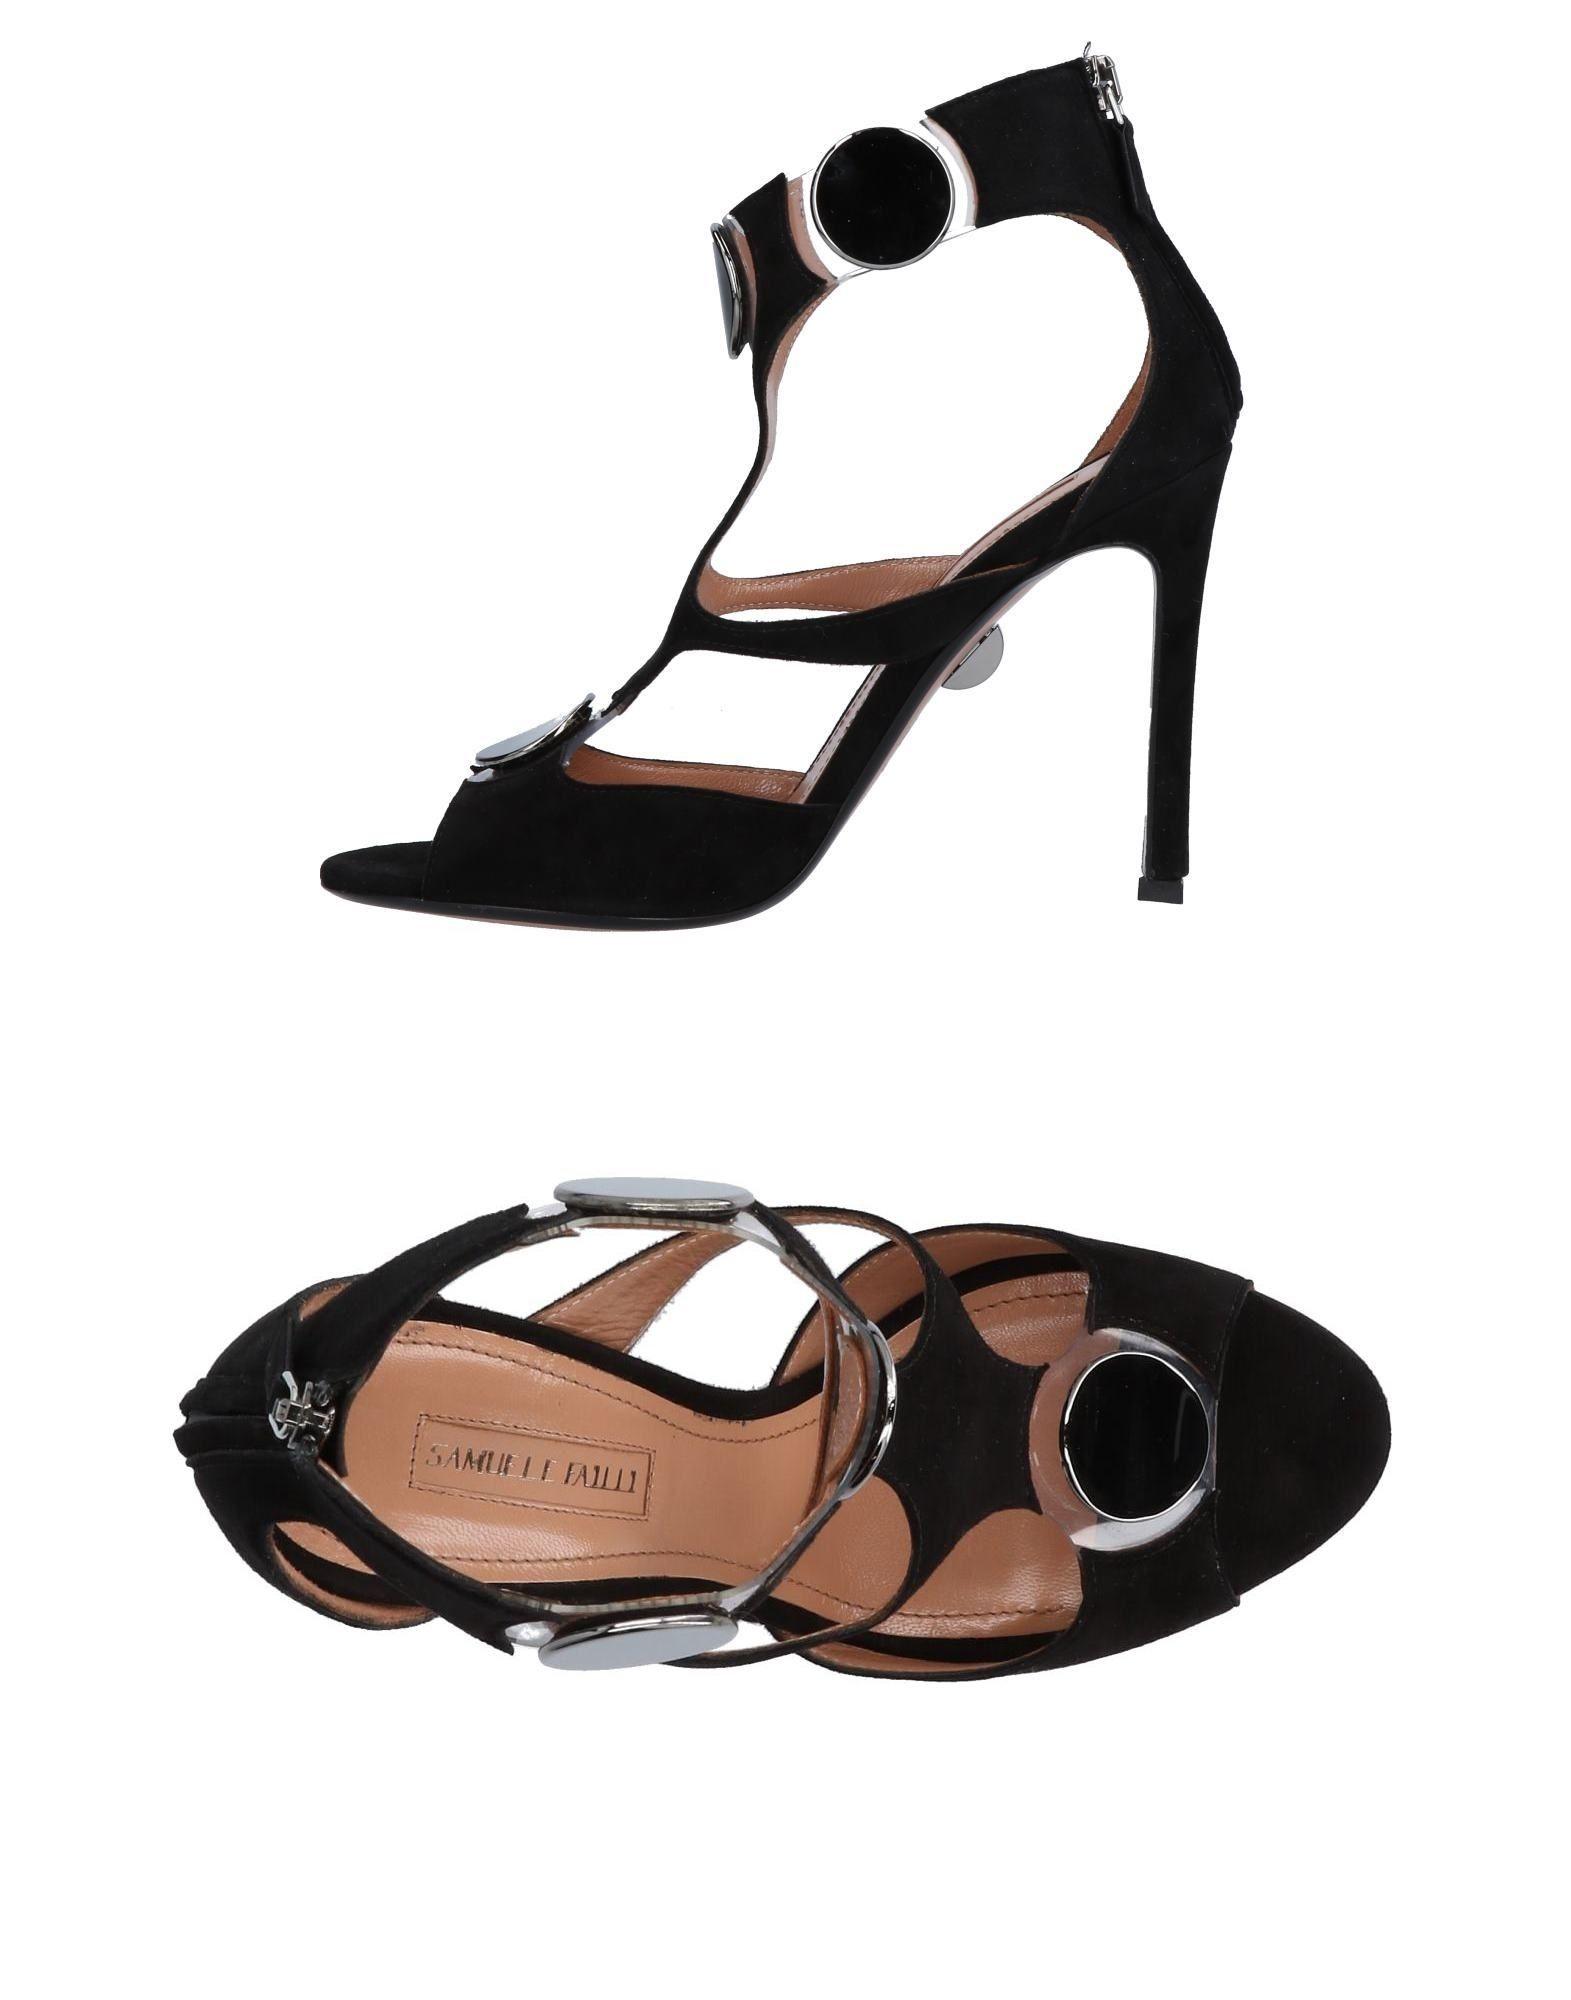 Samuele Samuele Failli Sandals - Women Samuele Samuele Failli Sandals online on  Canada - 11489079RT 2e5b89